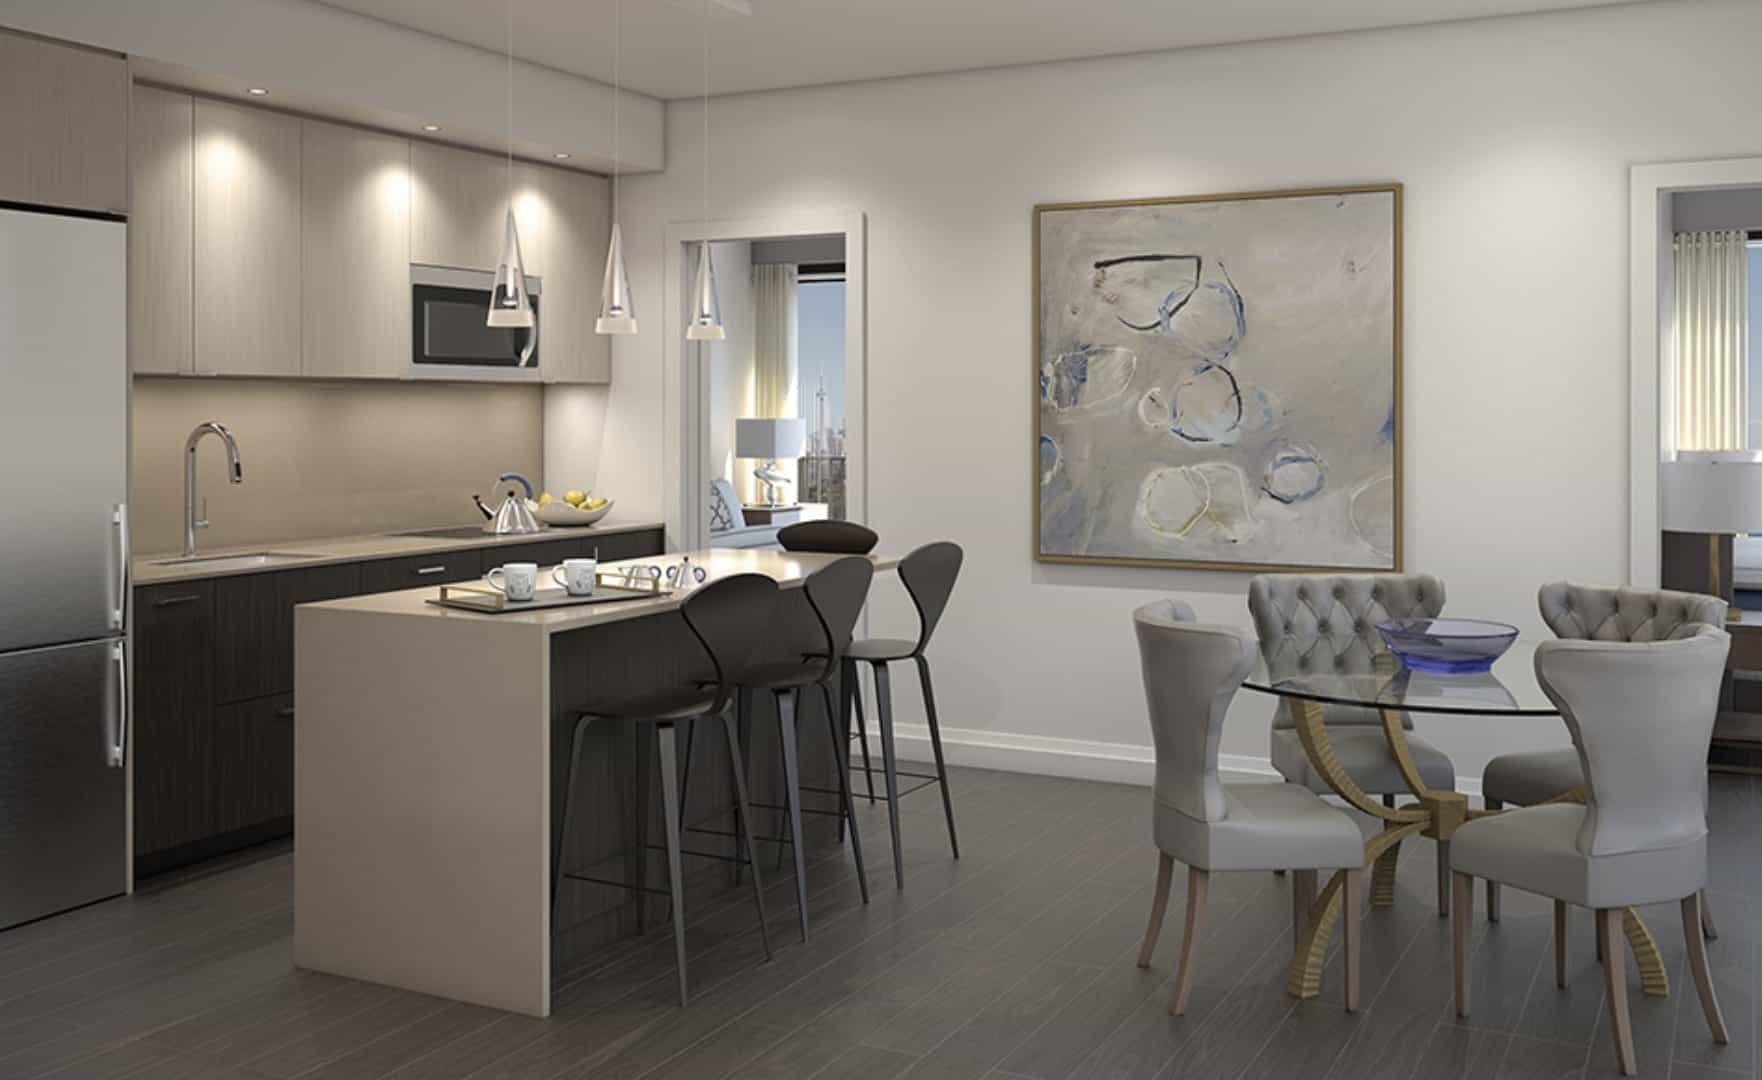 Mirabella Condos West Tower Interior Dining Kitchen True Condos